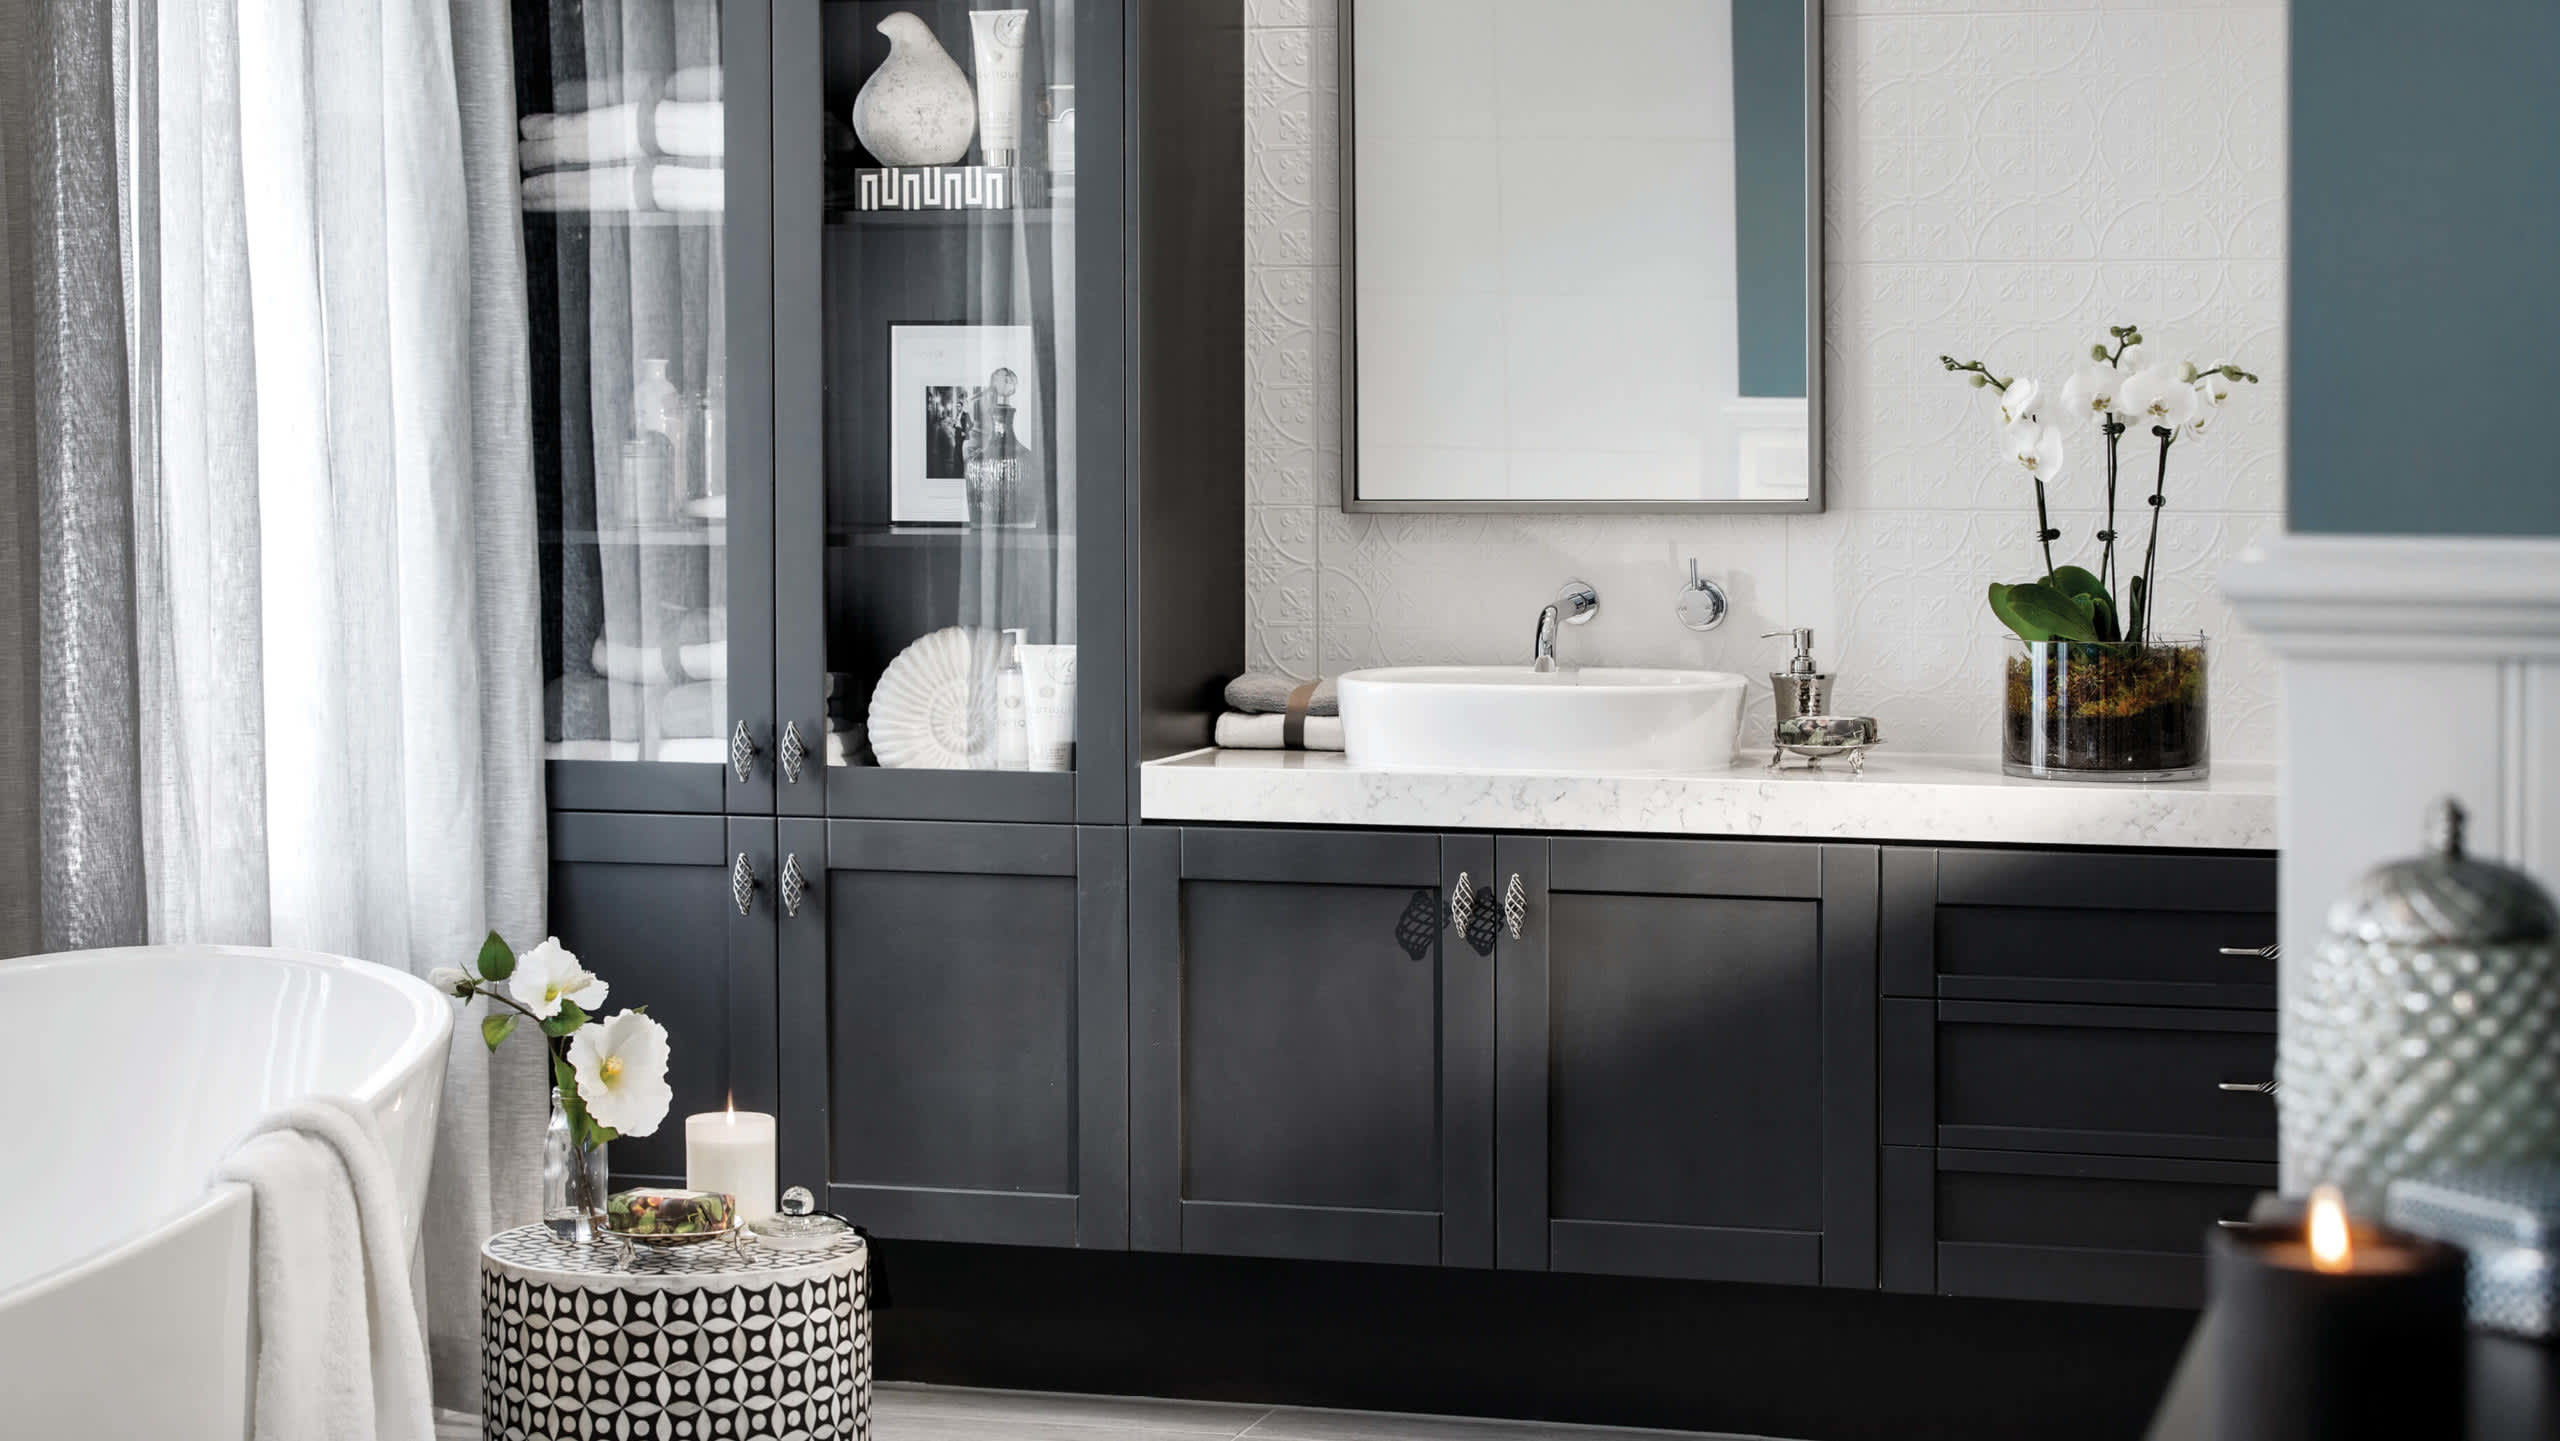 carousel image bathroom-astor_grange_54_upperpointcook_classic_hamptons-44